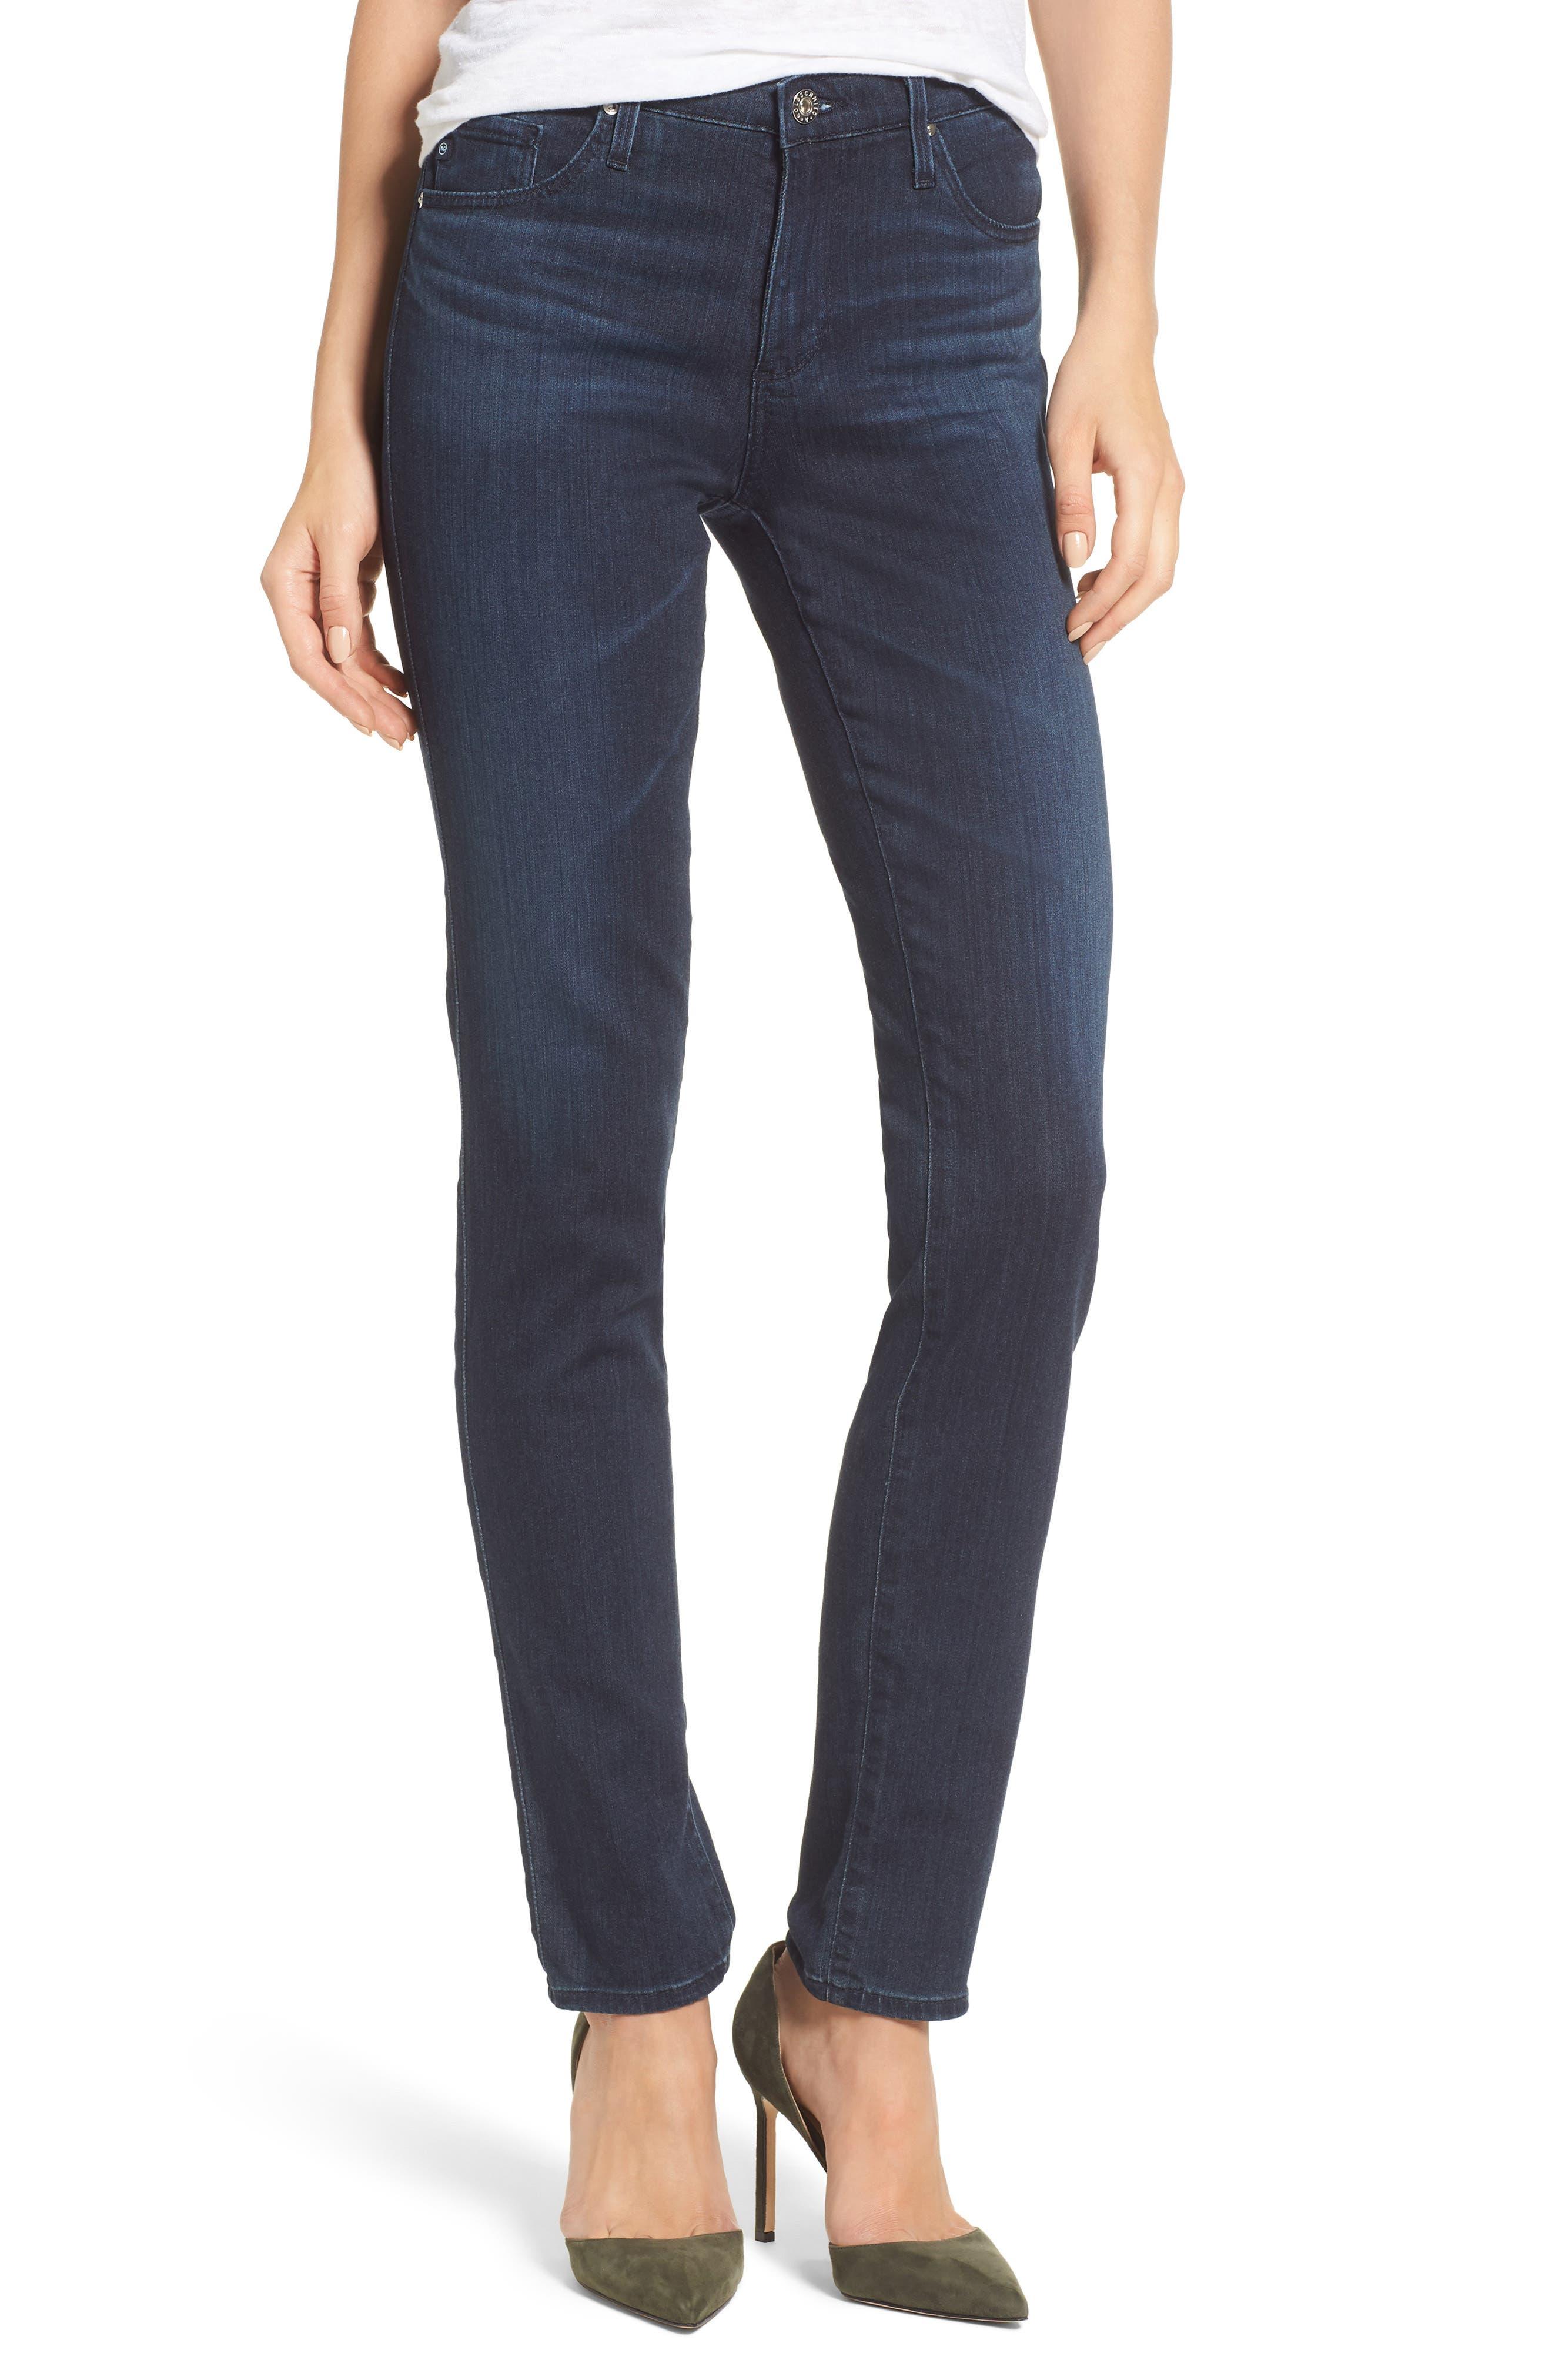 Main Image - AG 'The Prima' Mid Rise Cigarette Skinny Jeans (Gallant)